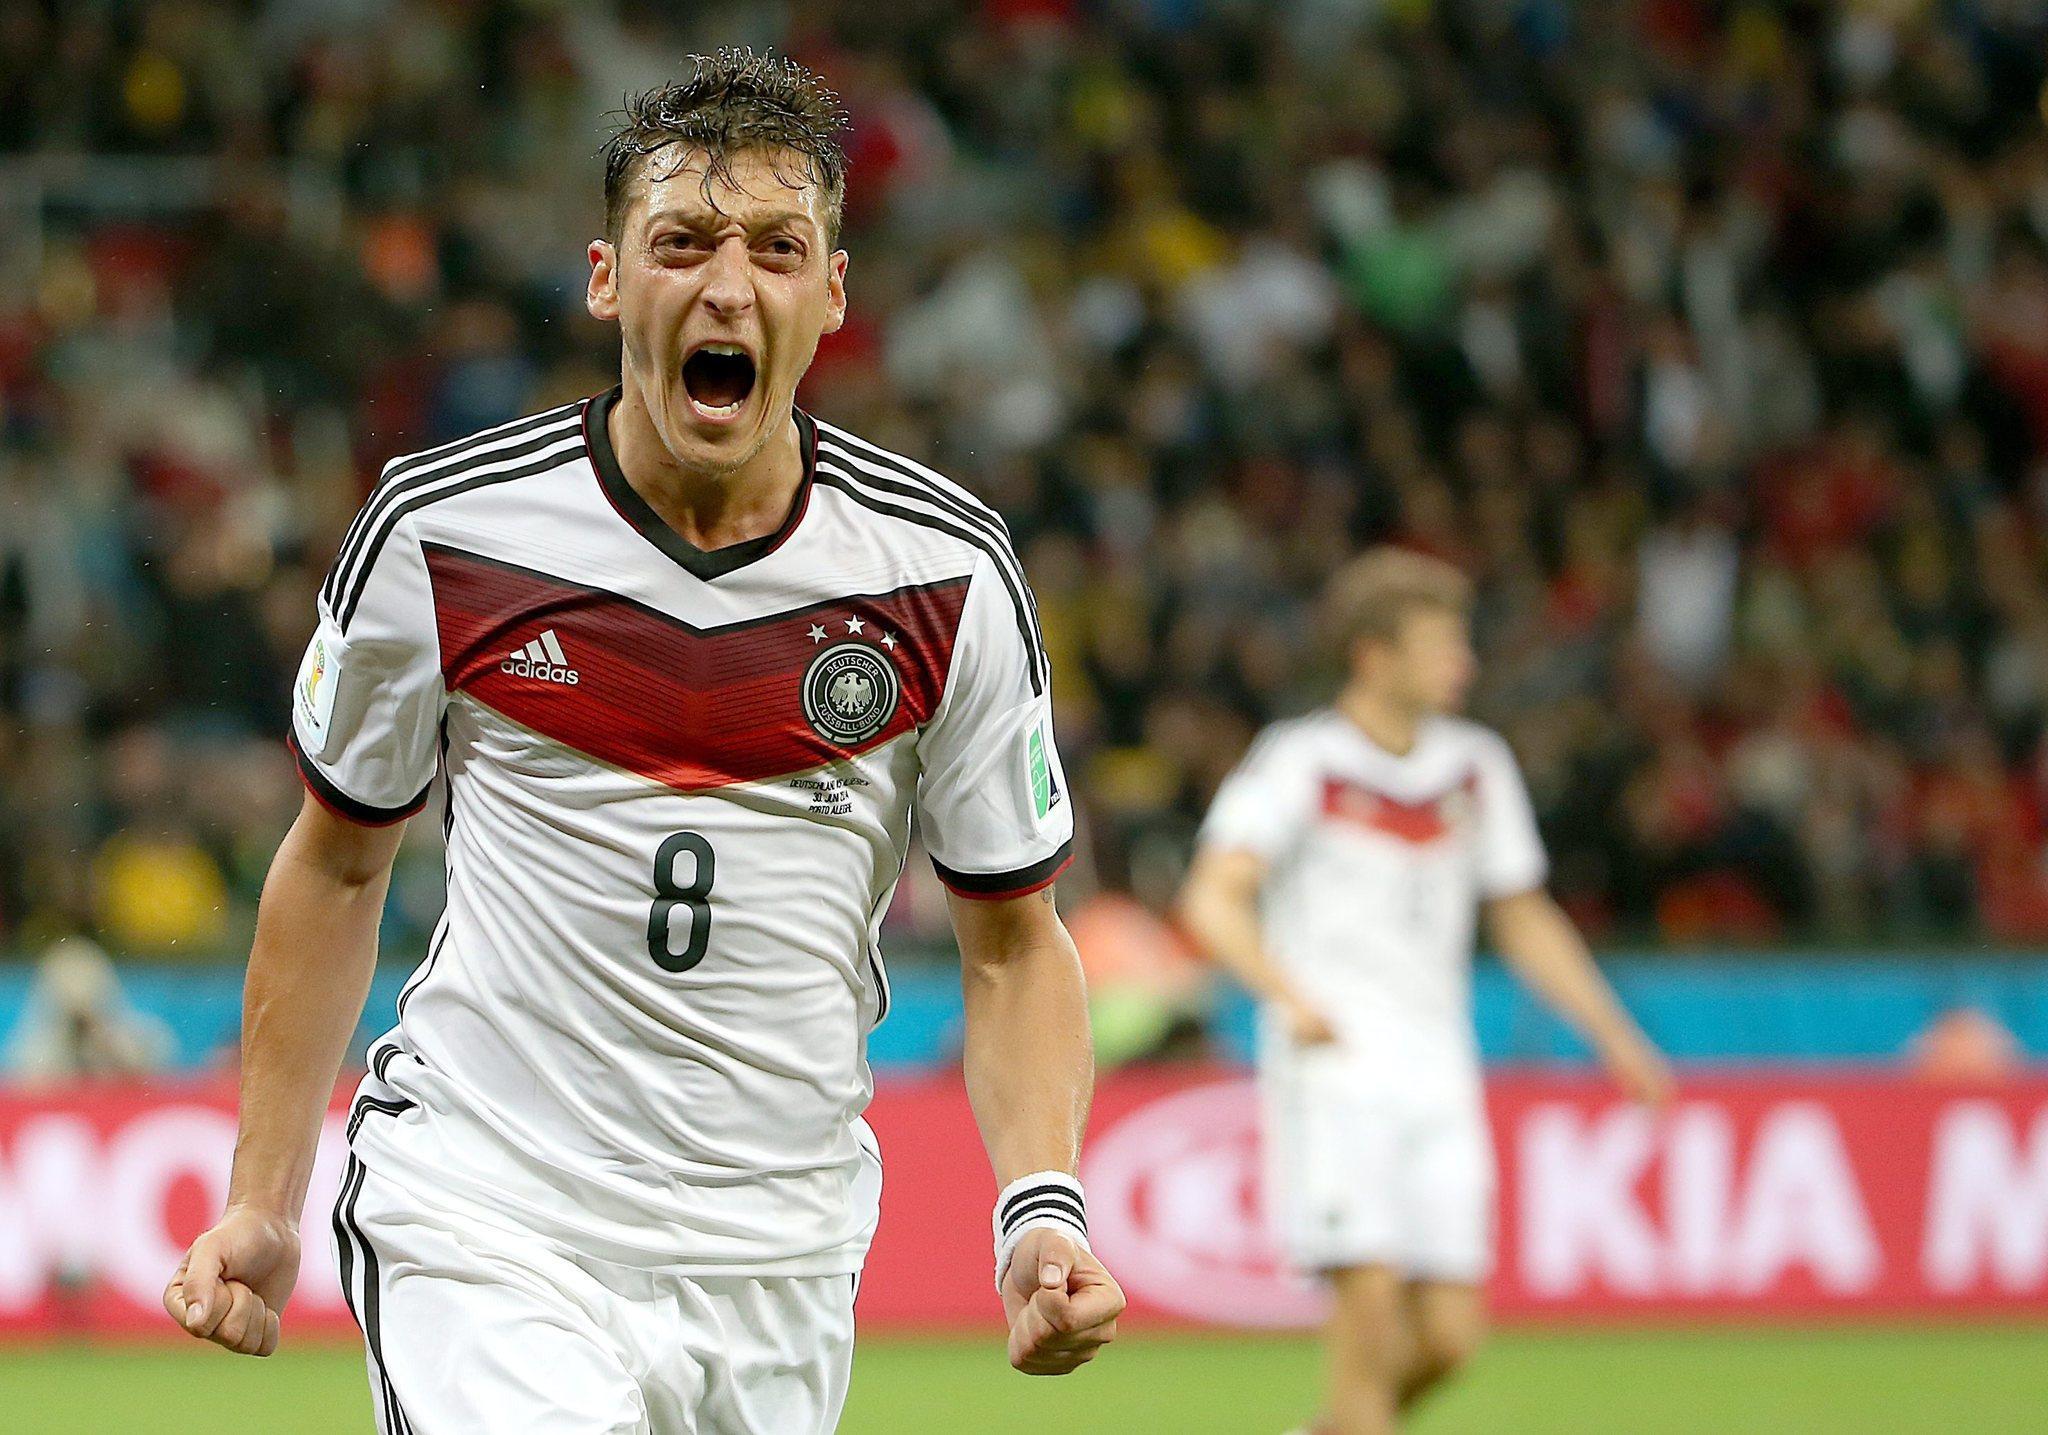 Mesut Oezil of Germany celebrates a goal Monday.